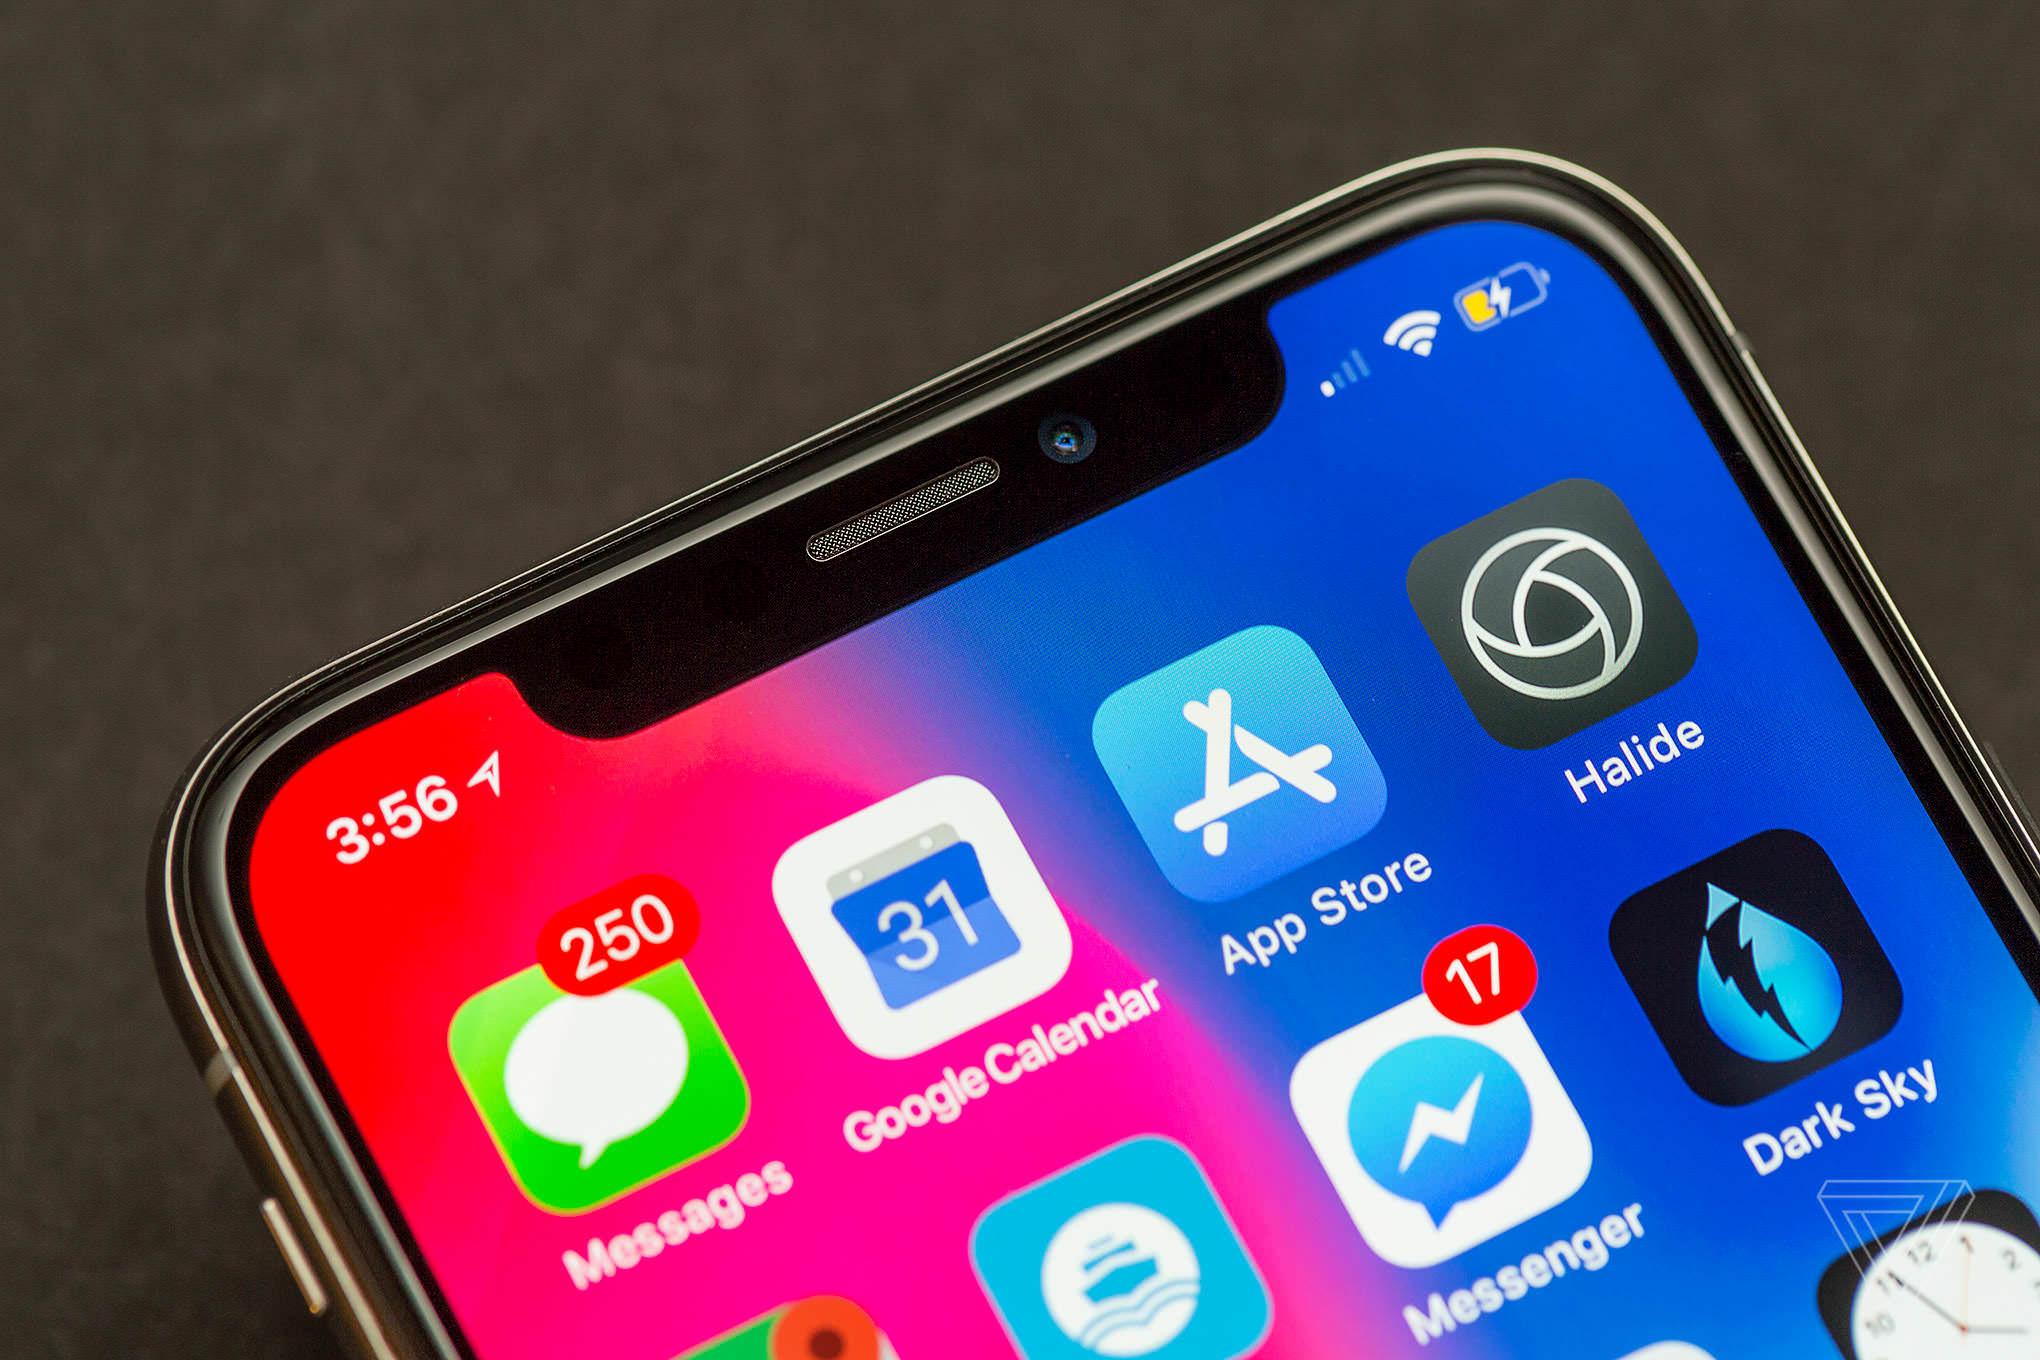 launcher theme iphone x тема айфон х на телефон андроид